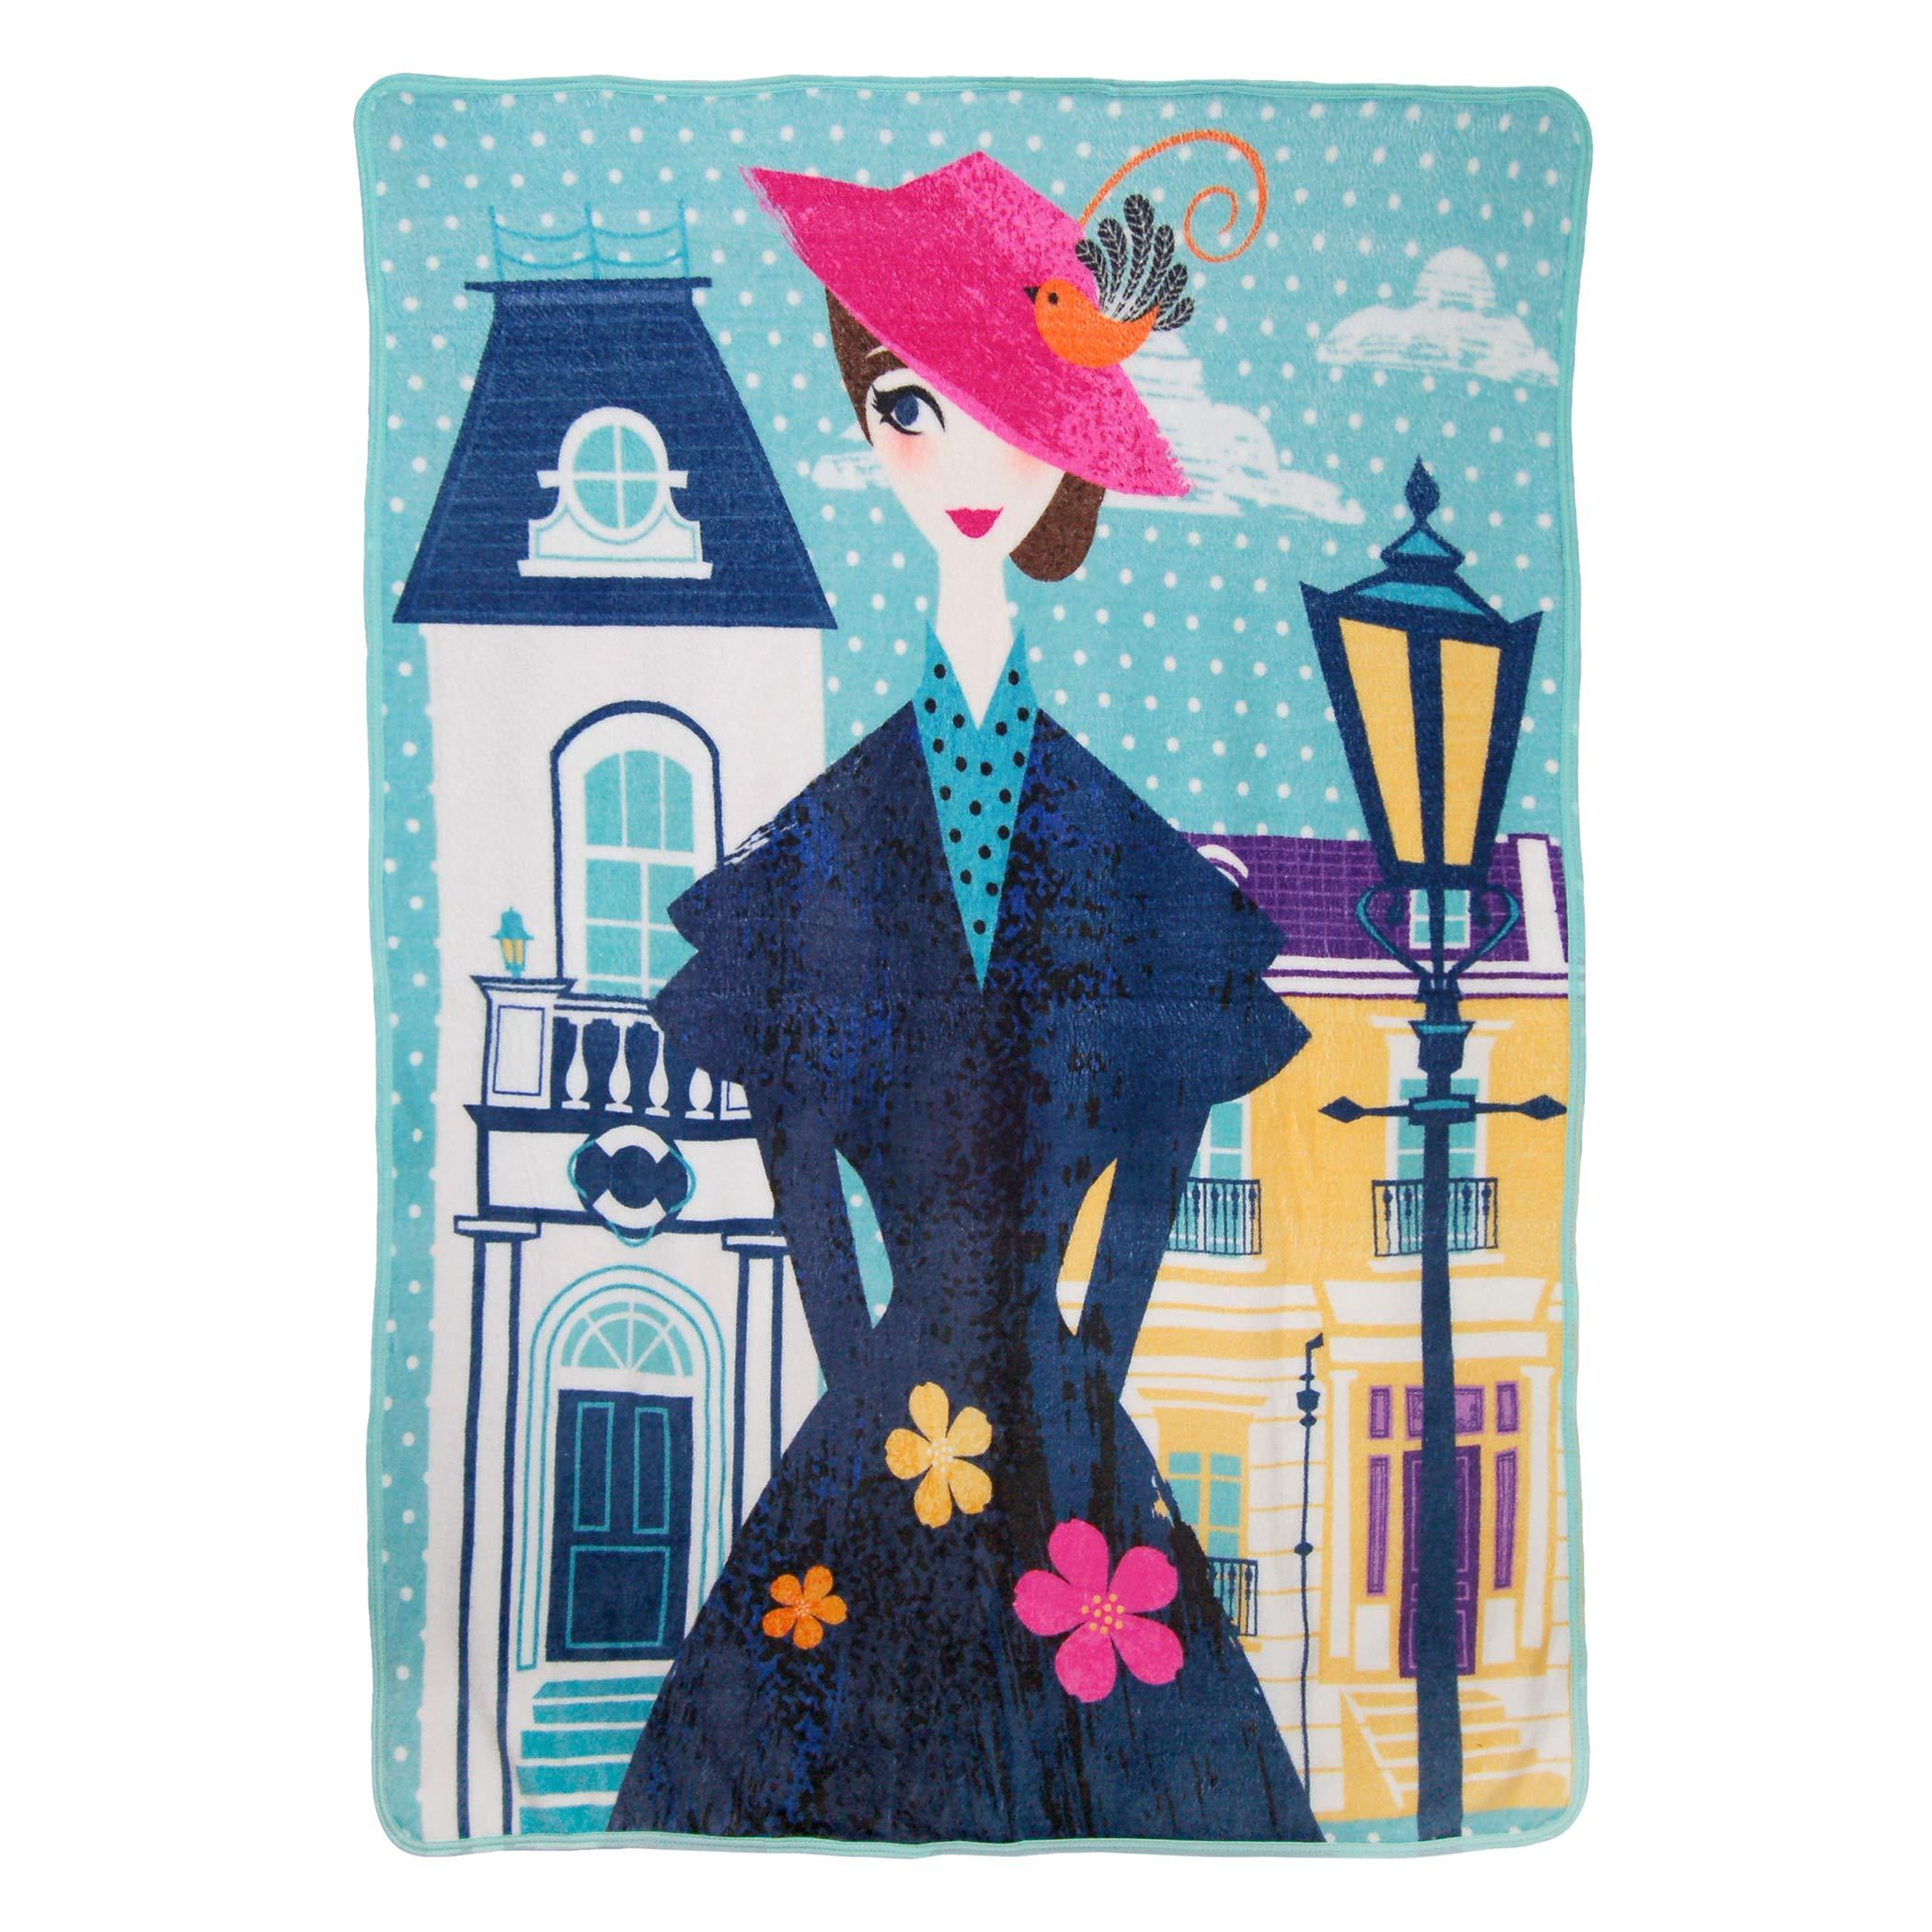 Disney's Mary Poppins Returns, ''Chim Chiminy'' Micro Raschel Throw Blanket, 46'' x 60'' , Multi Color